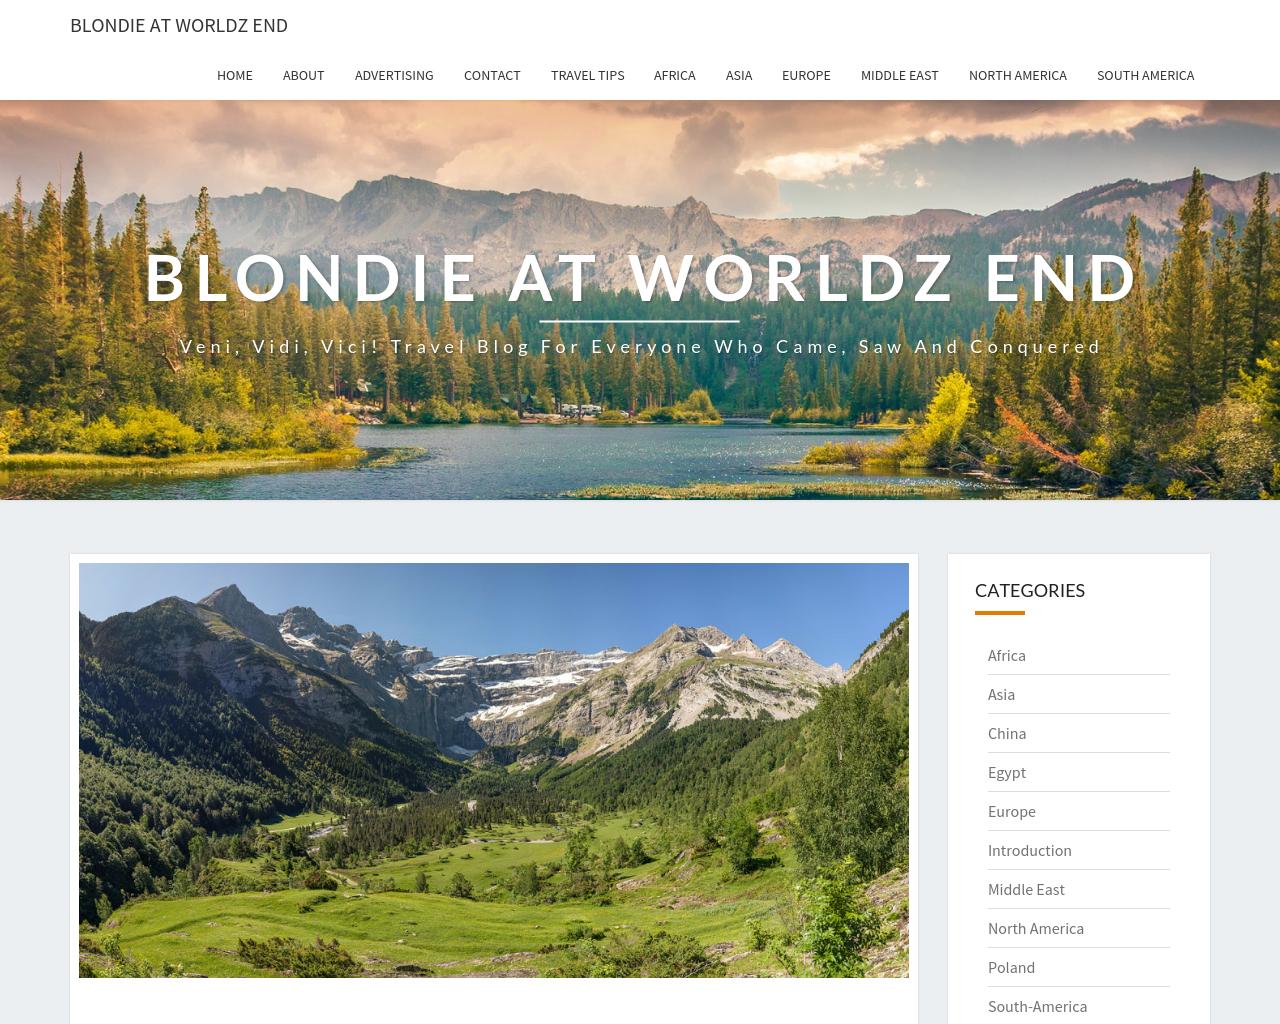 Blondie-at-Worldz-End-Advertising-Reviews-Pricing